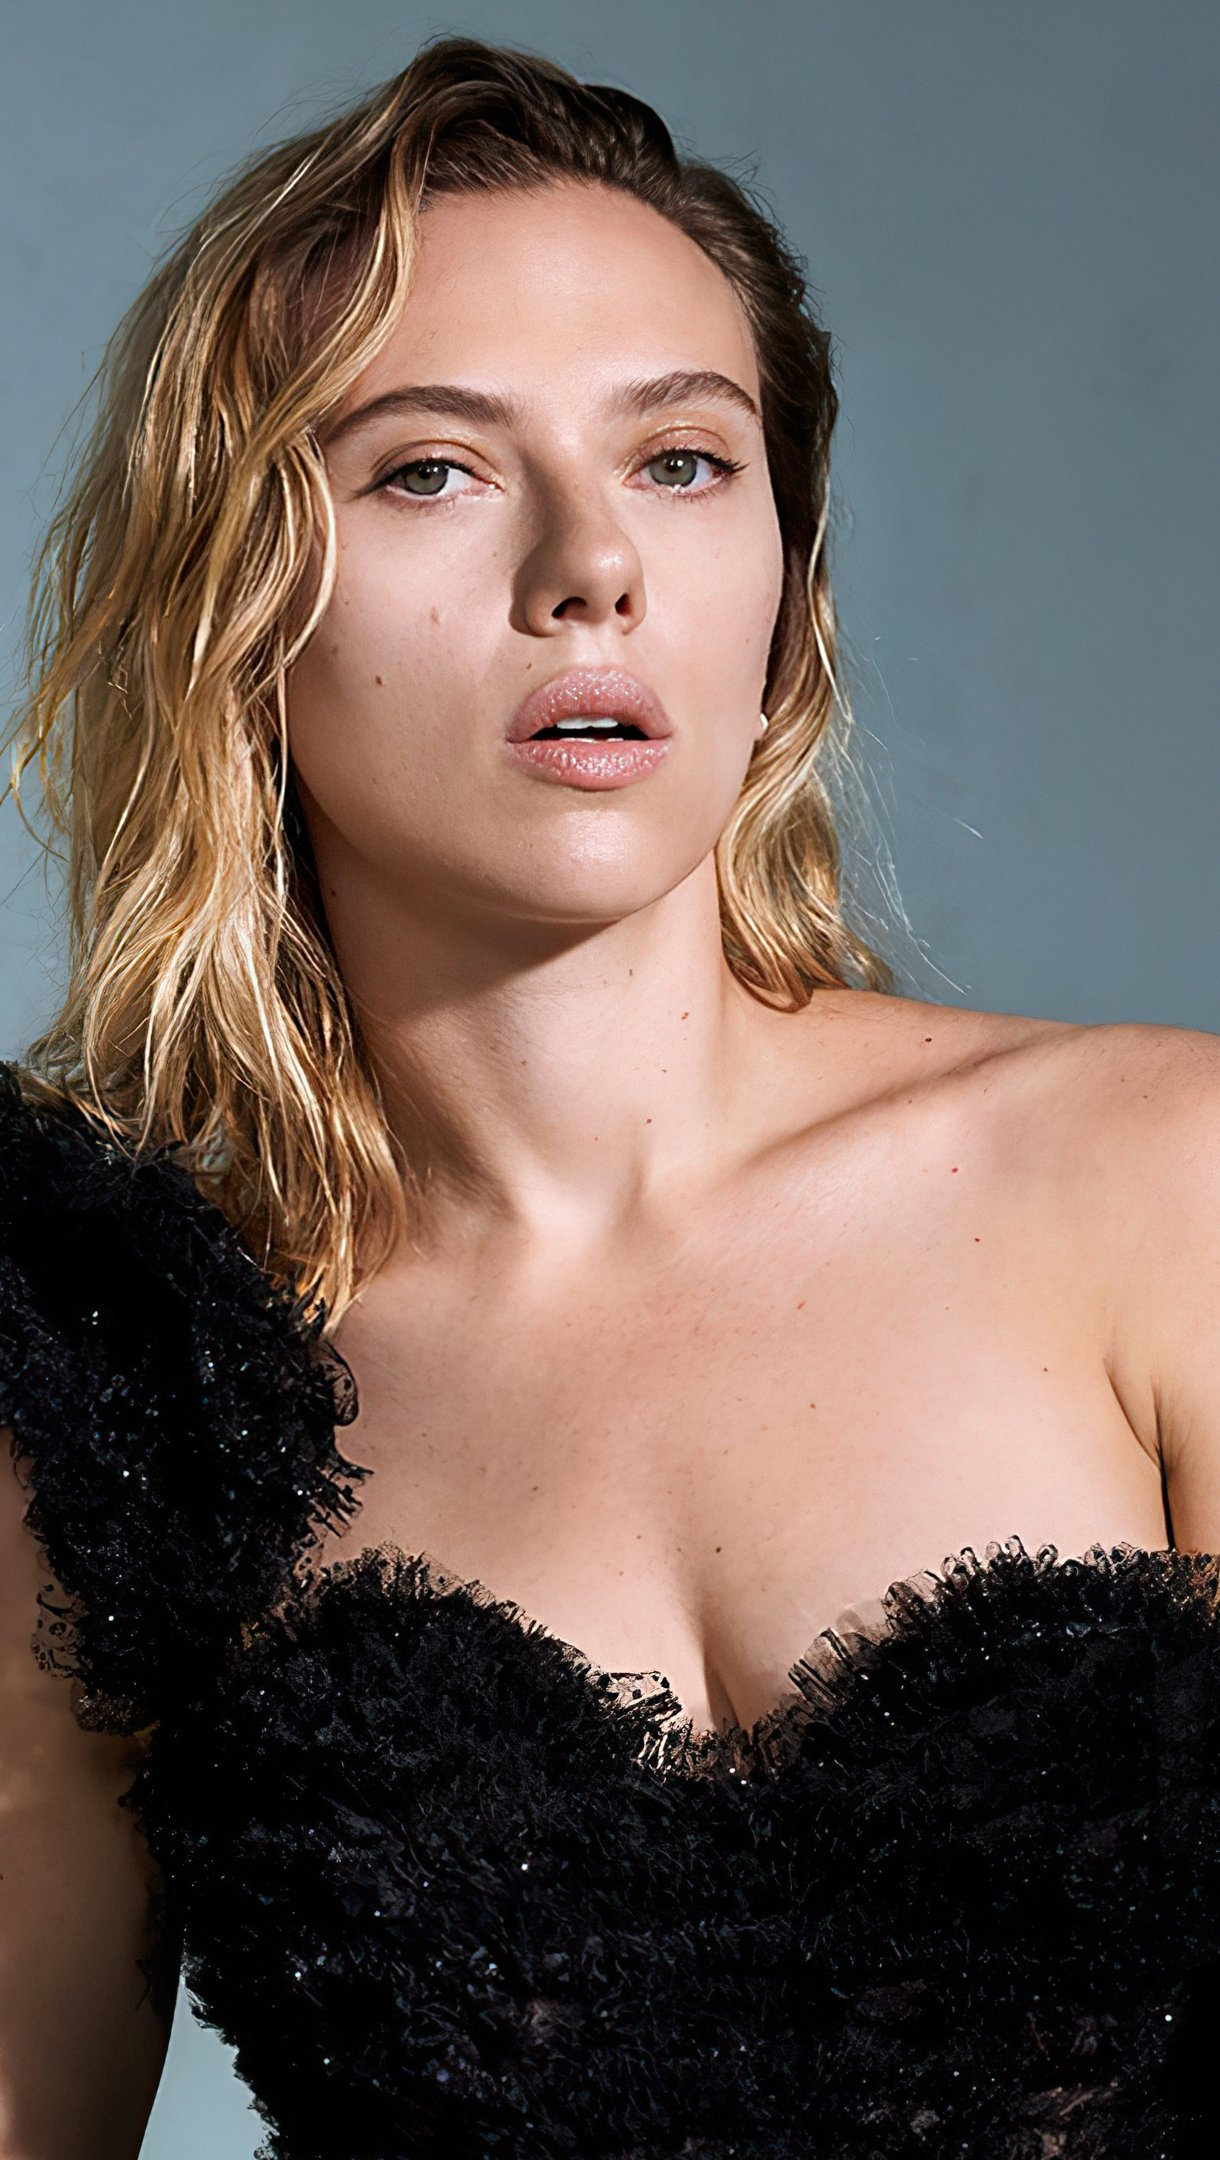 Fondos de pantalla Scarlett Johansson 2020 Vertical